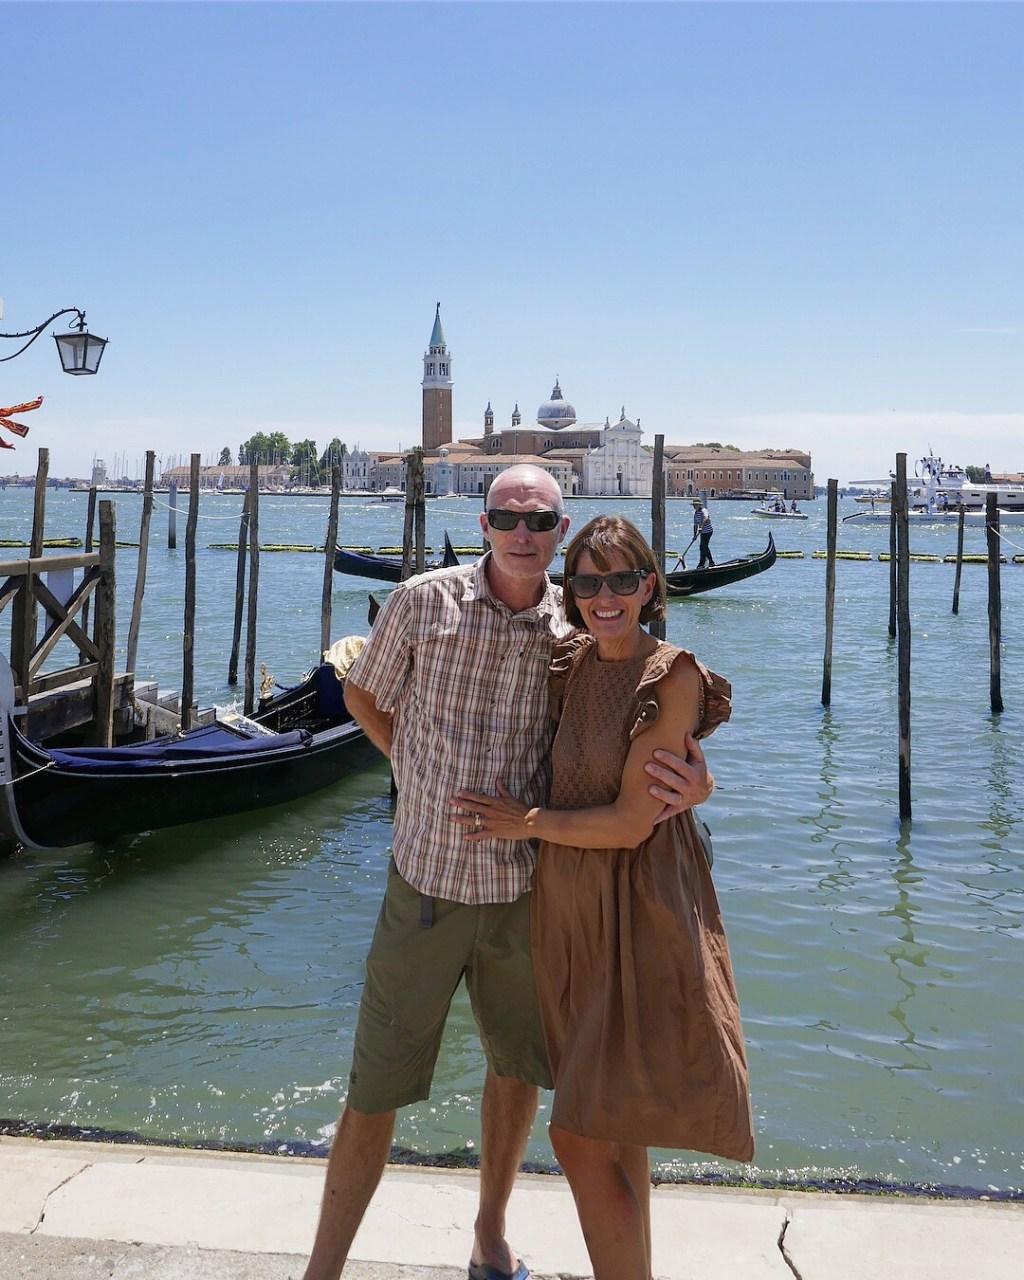 Venice in a Campervan